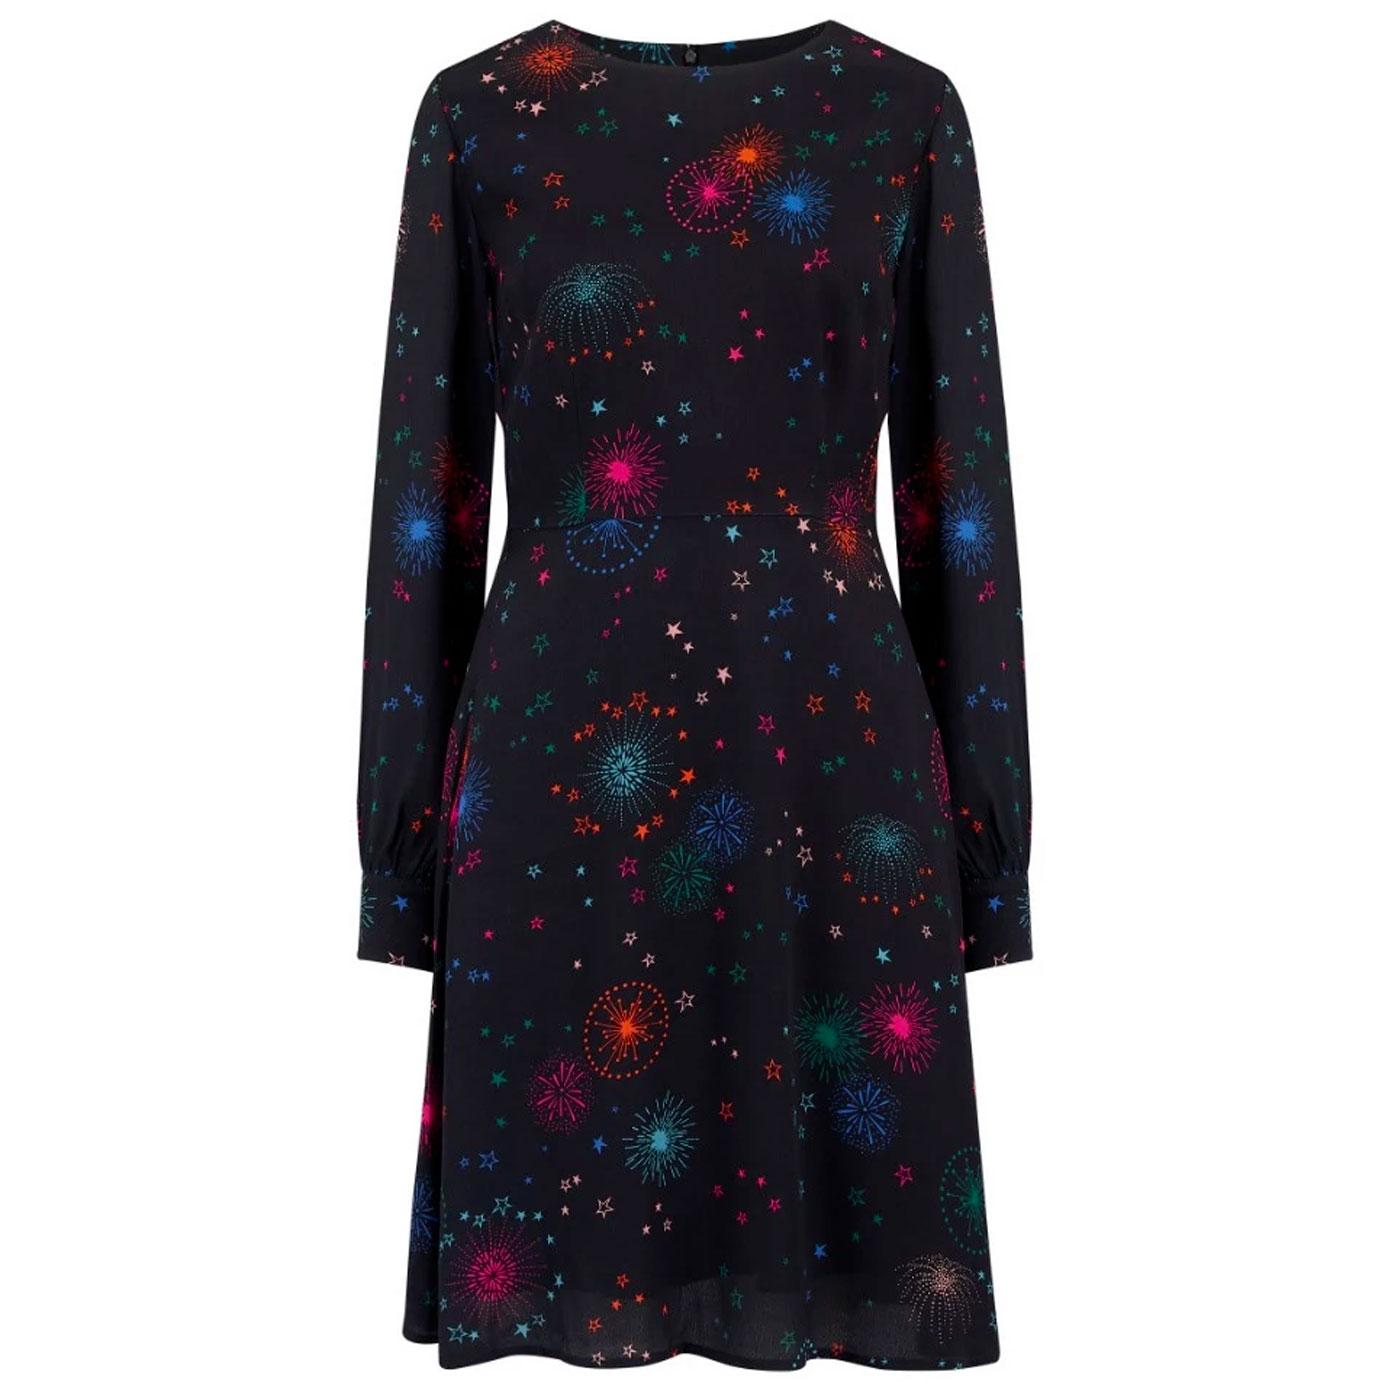 Jocelyn SUGARHILL BRIGHTON Fireworks Print Dress